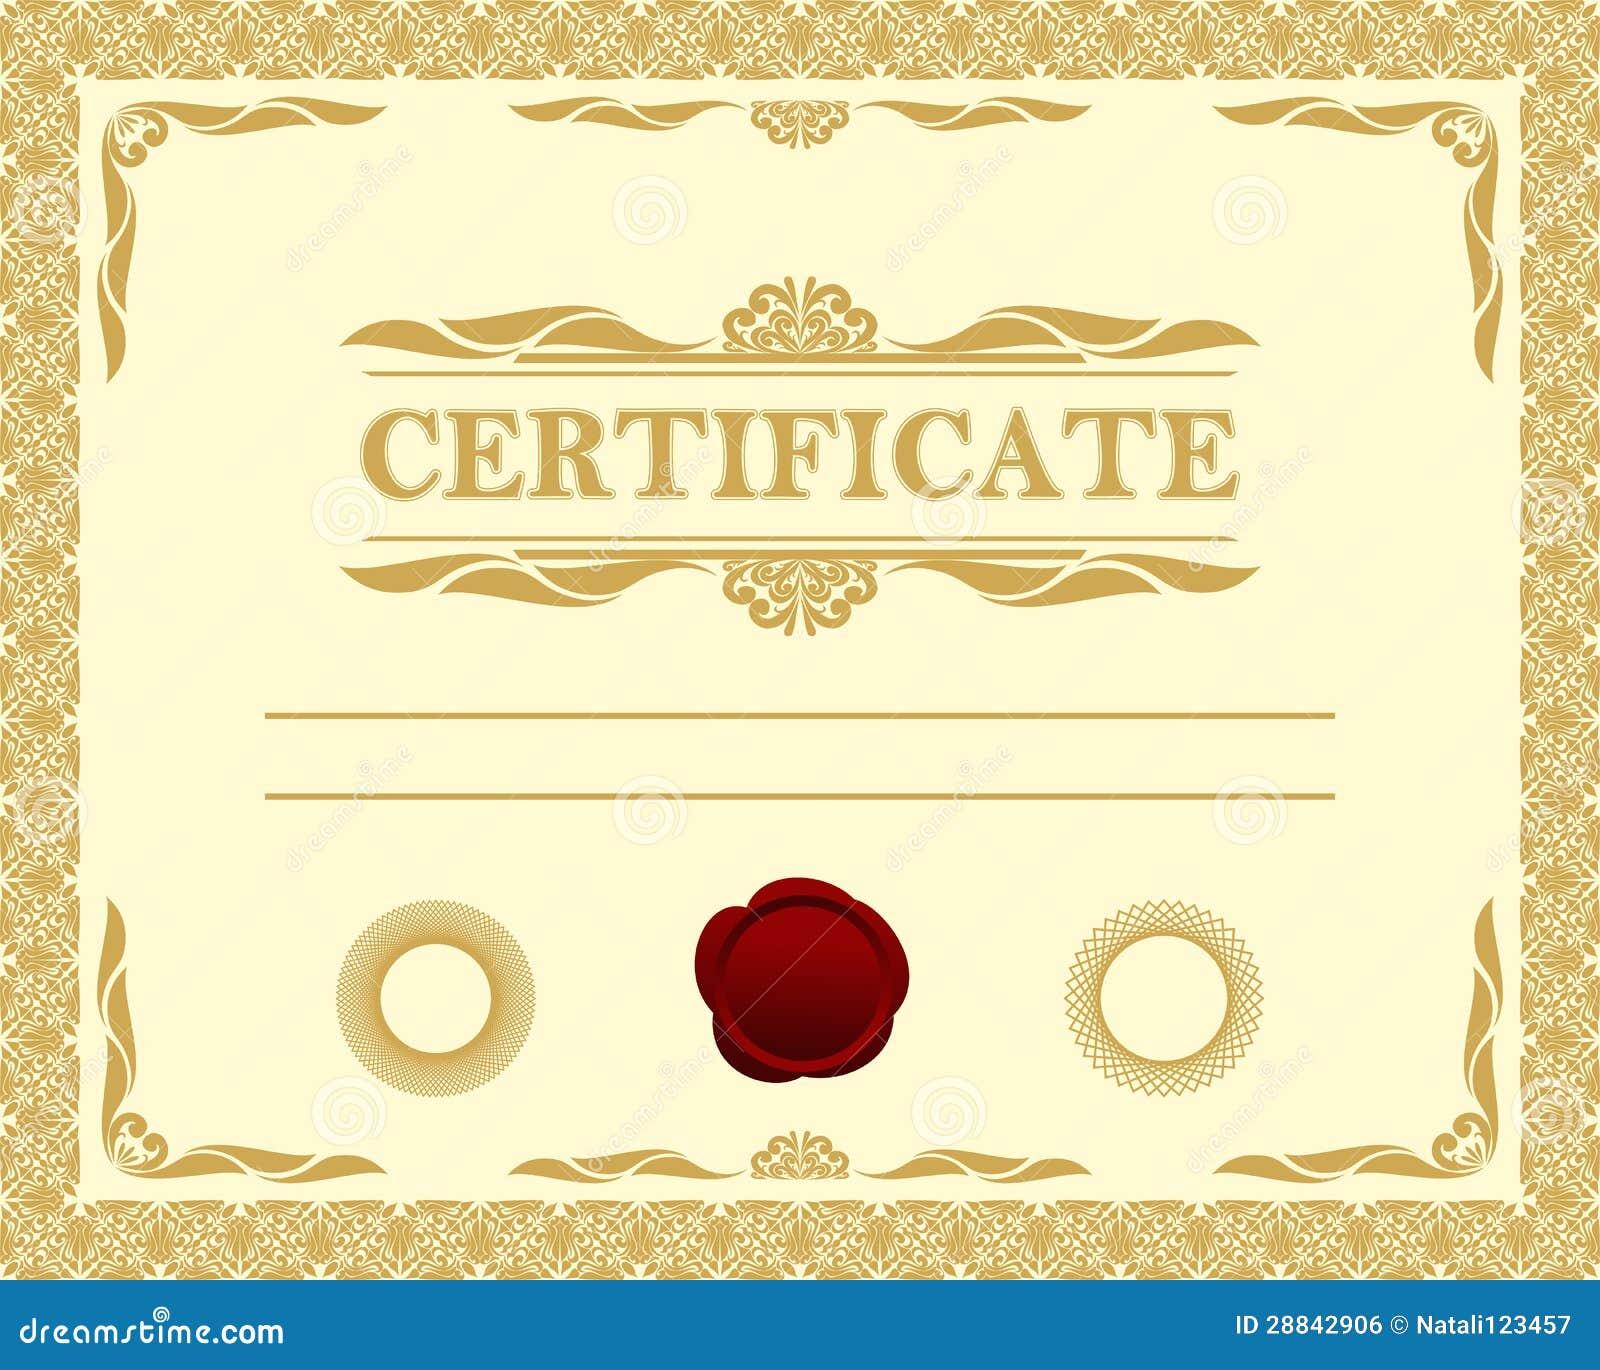 Amazoncom promotional certificate